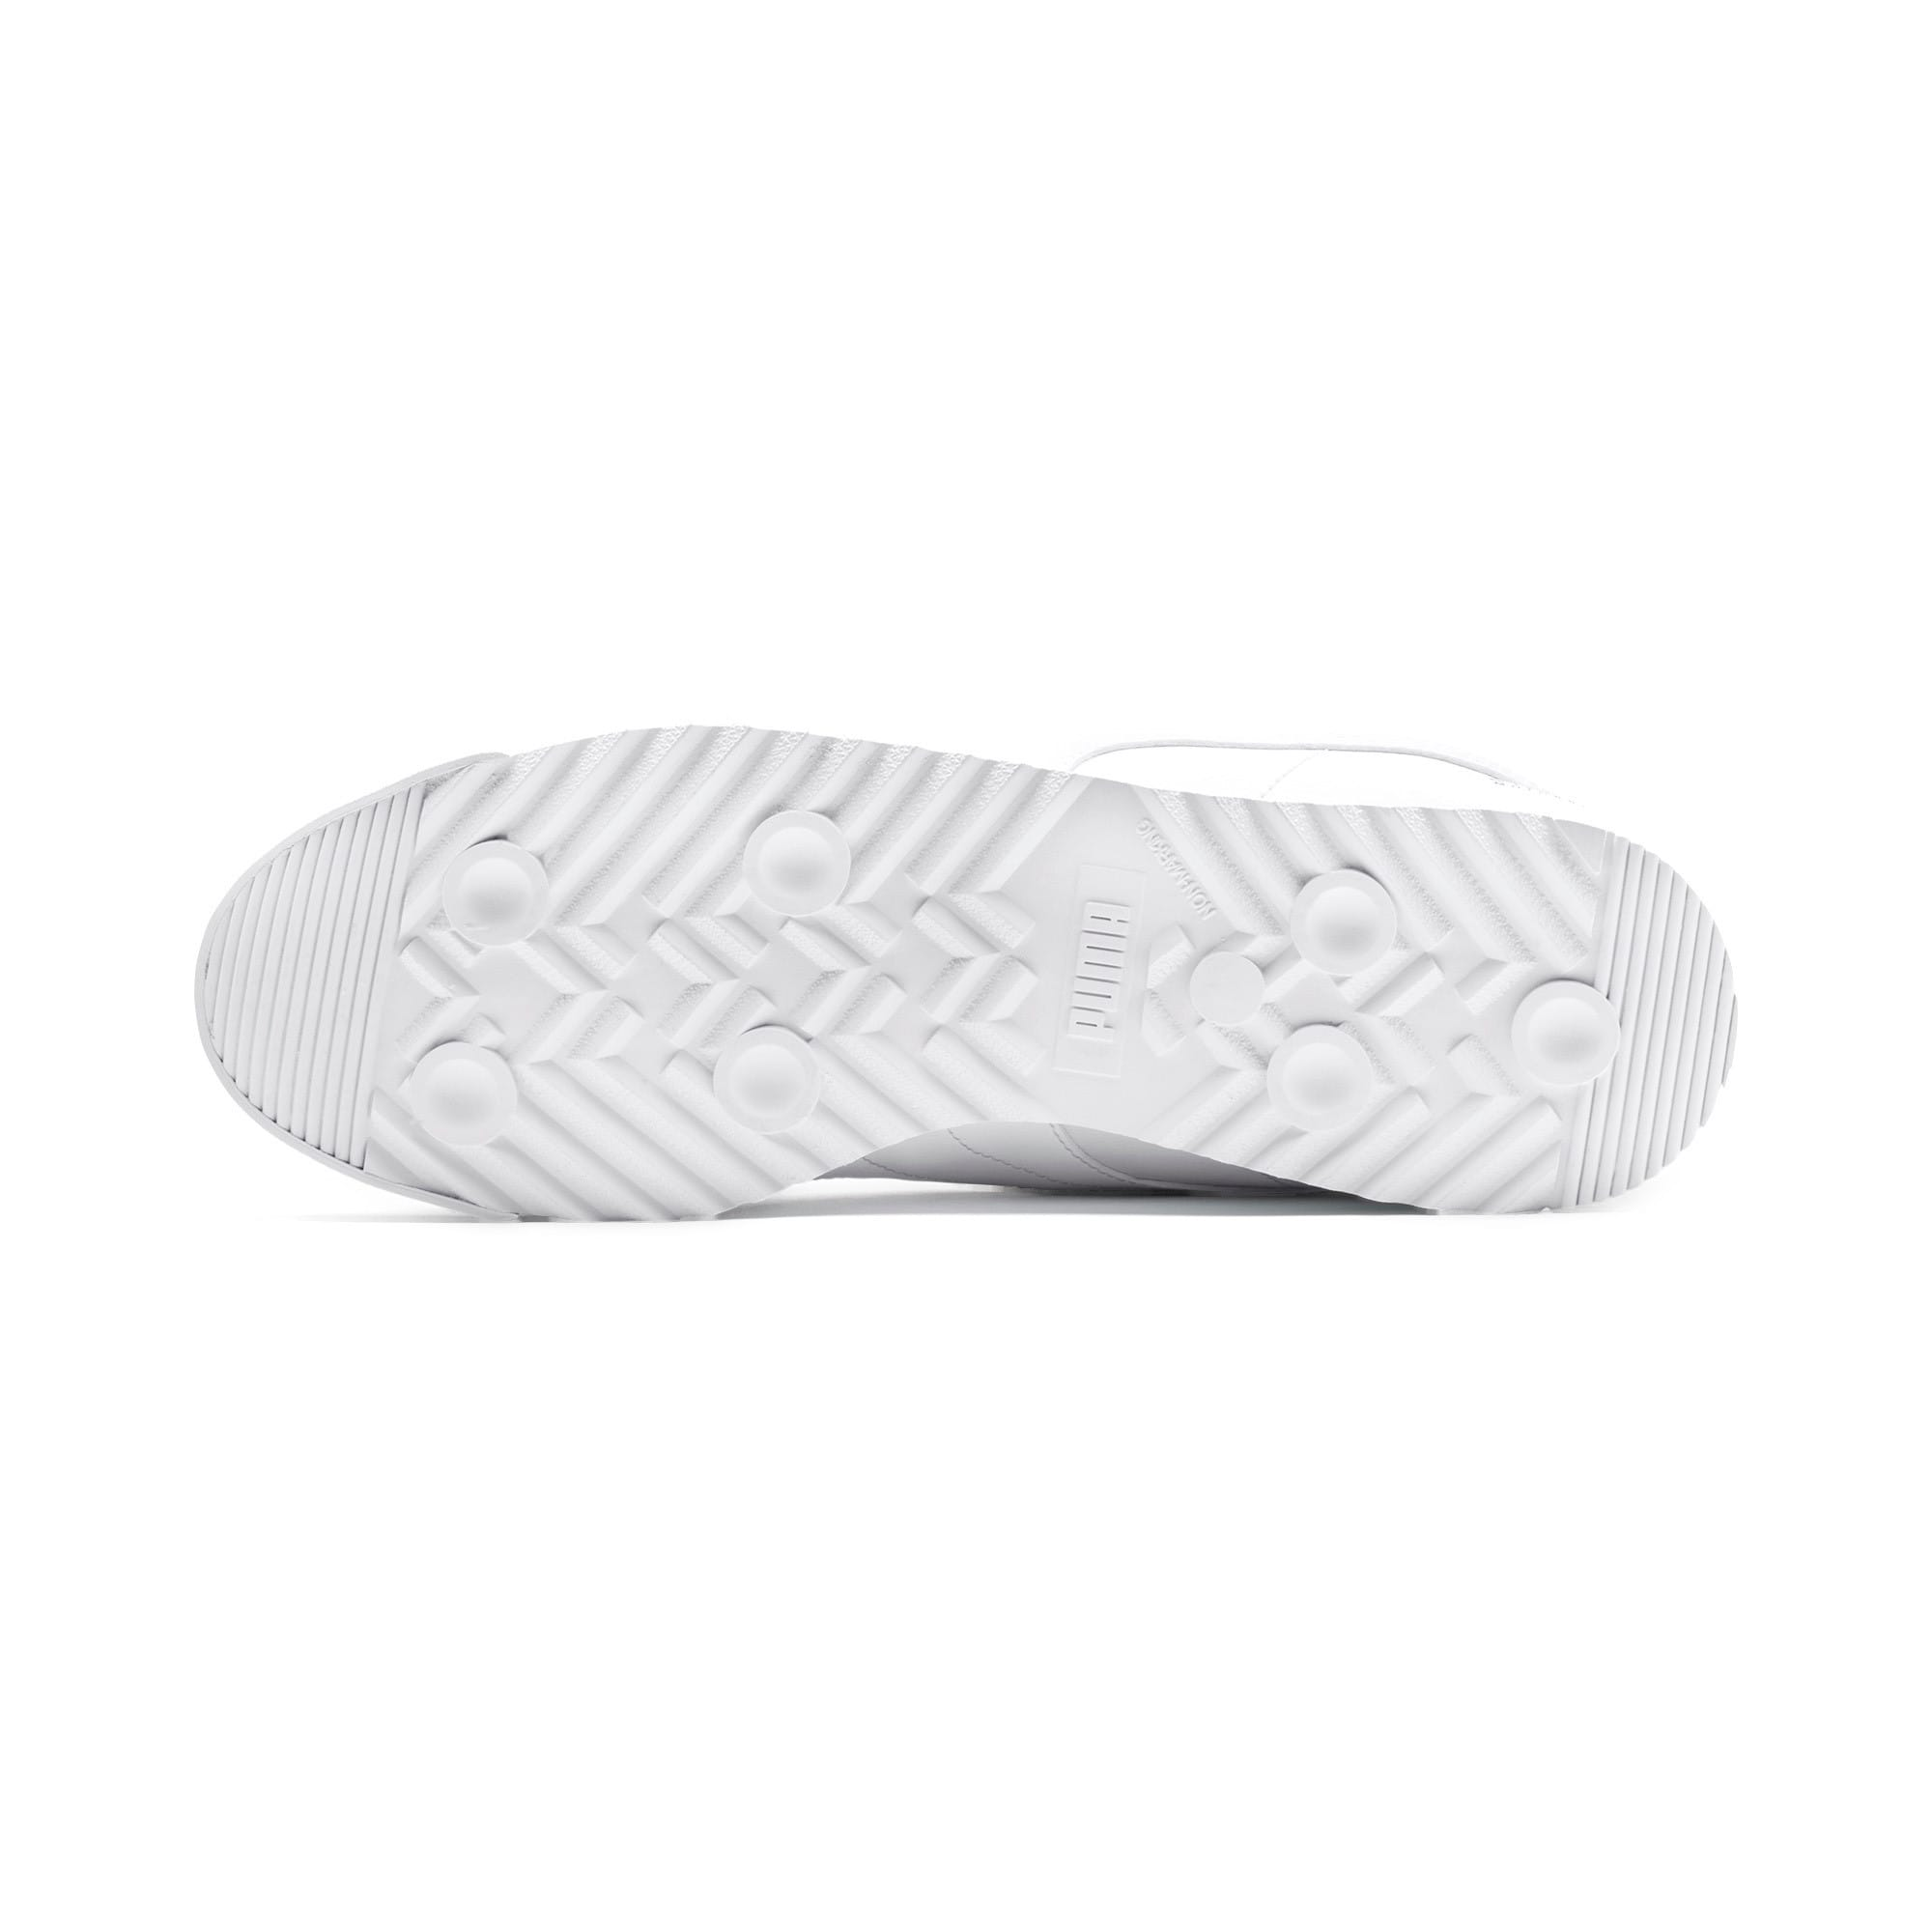 Thumbnail 5 of Mercedes AMG Petronas Roma Men's Sneakers, Puma White-Puma White, medium